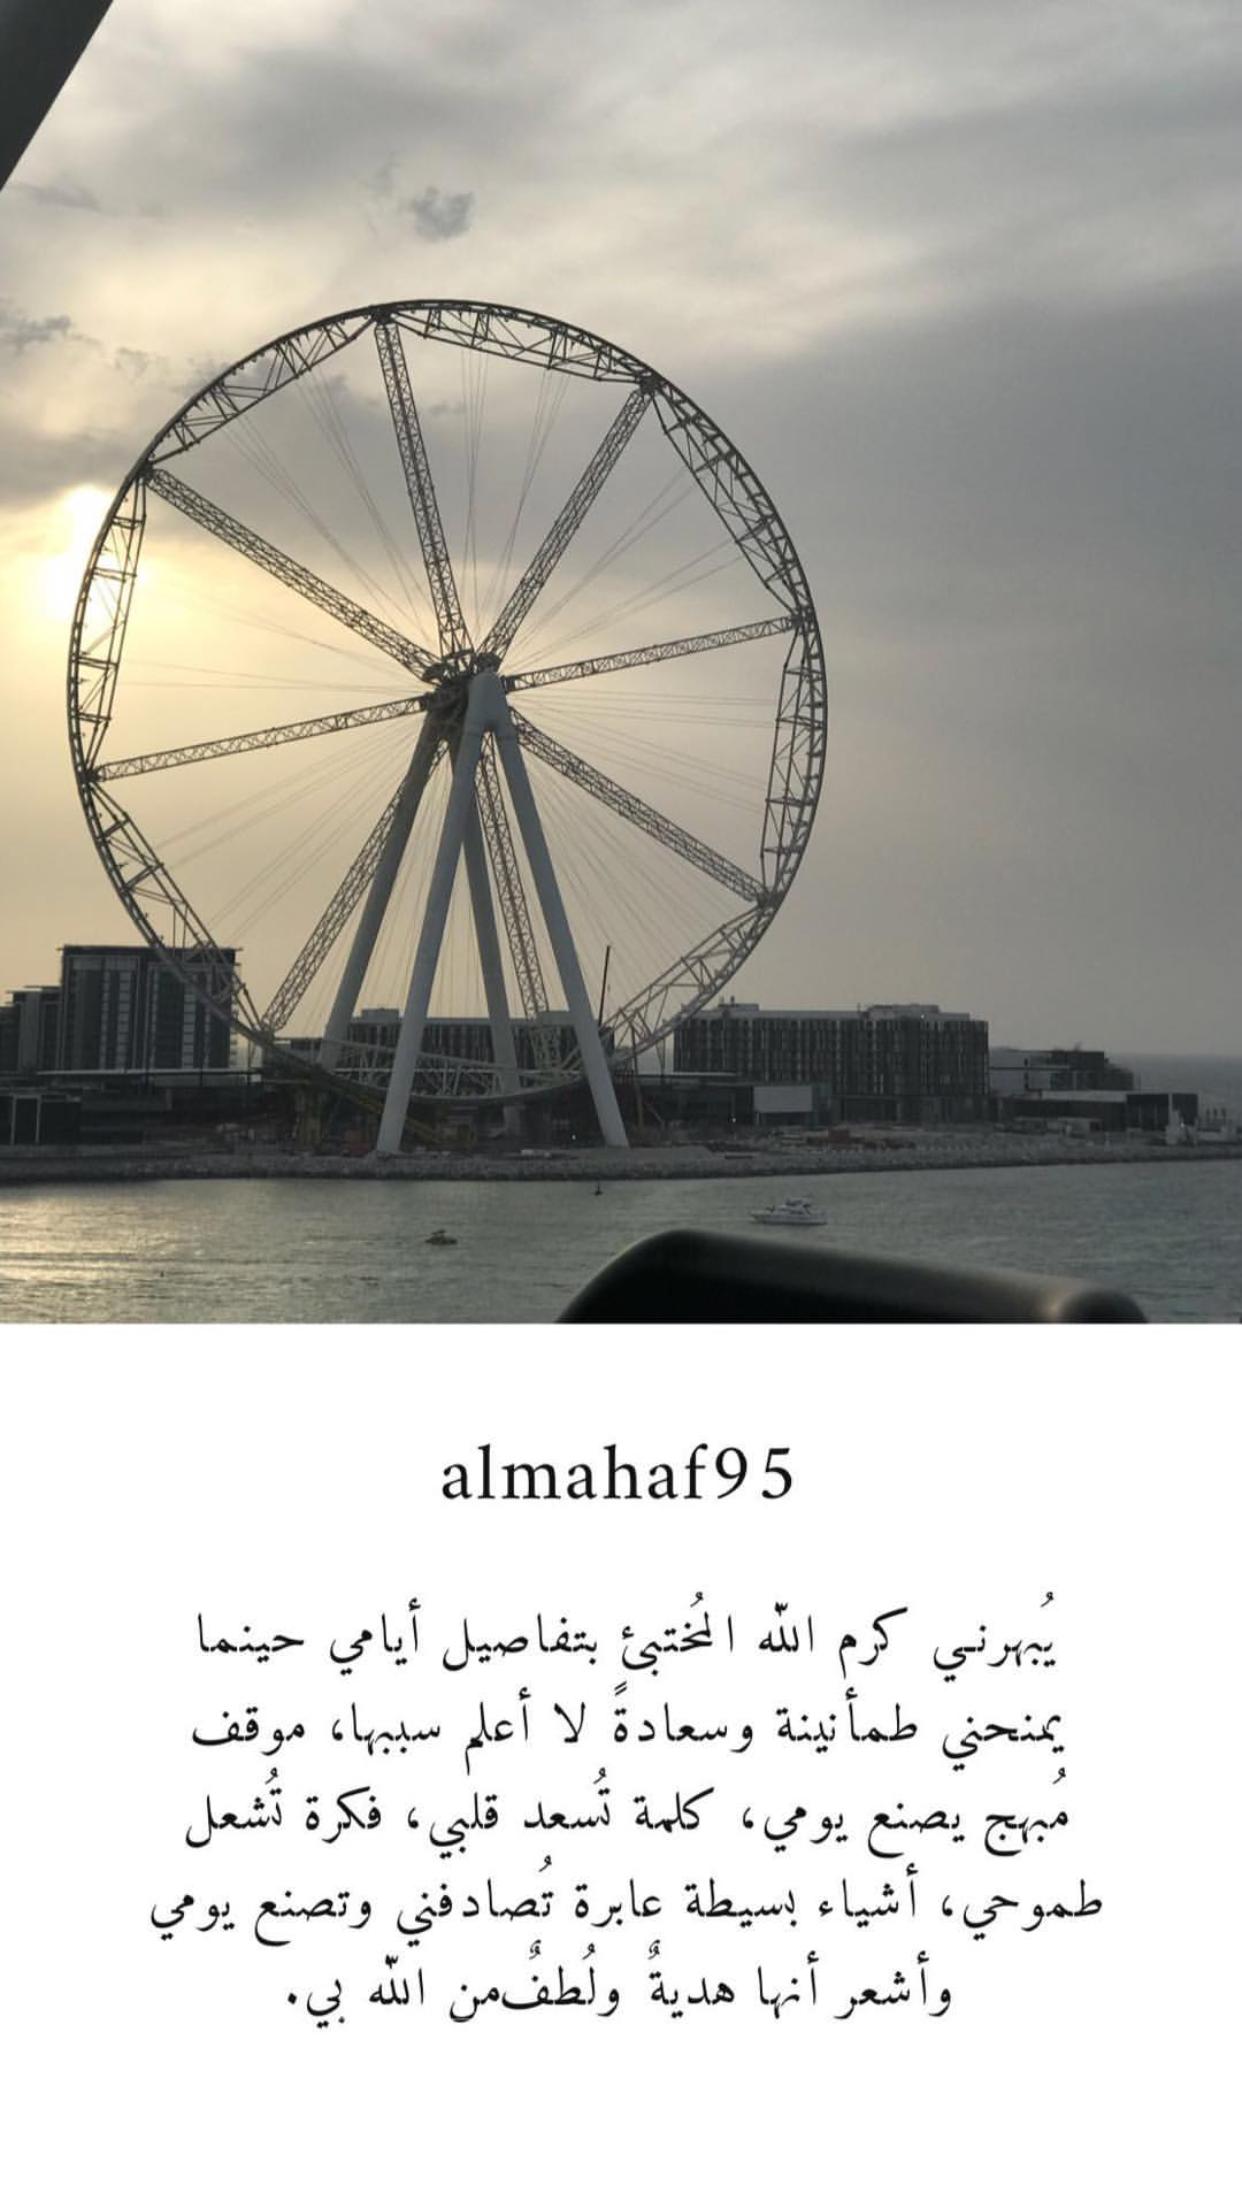 Pin By Amal Al Balawi On ايجابية طموح الله ثقة عبارات مستقبل صور رمزيات سعادة Fair Grounds Grounds Travel